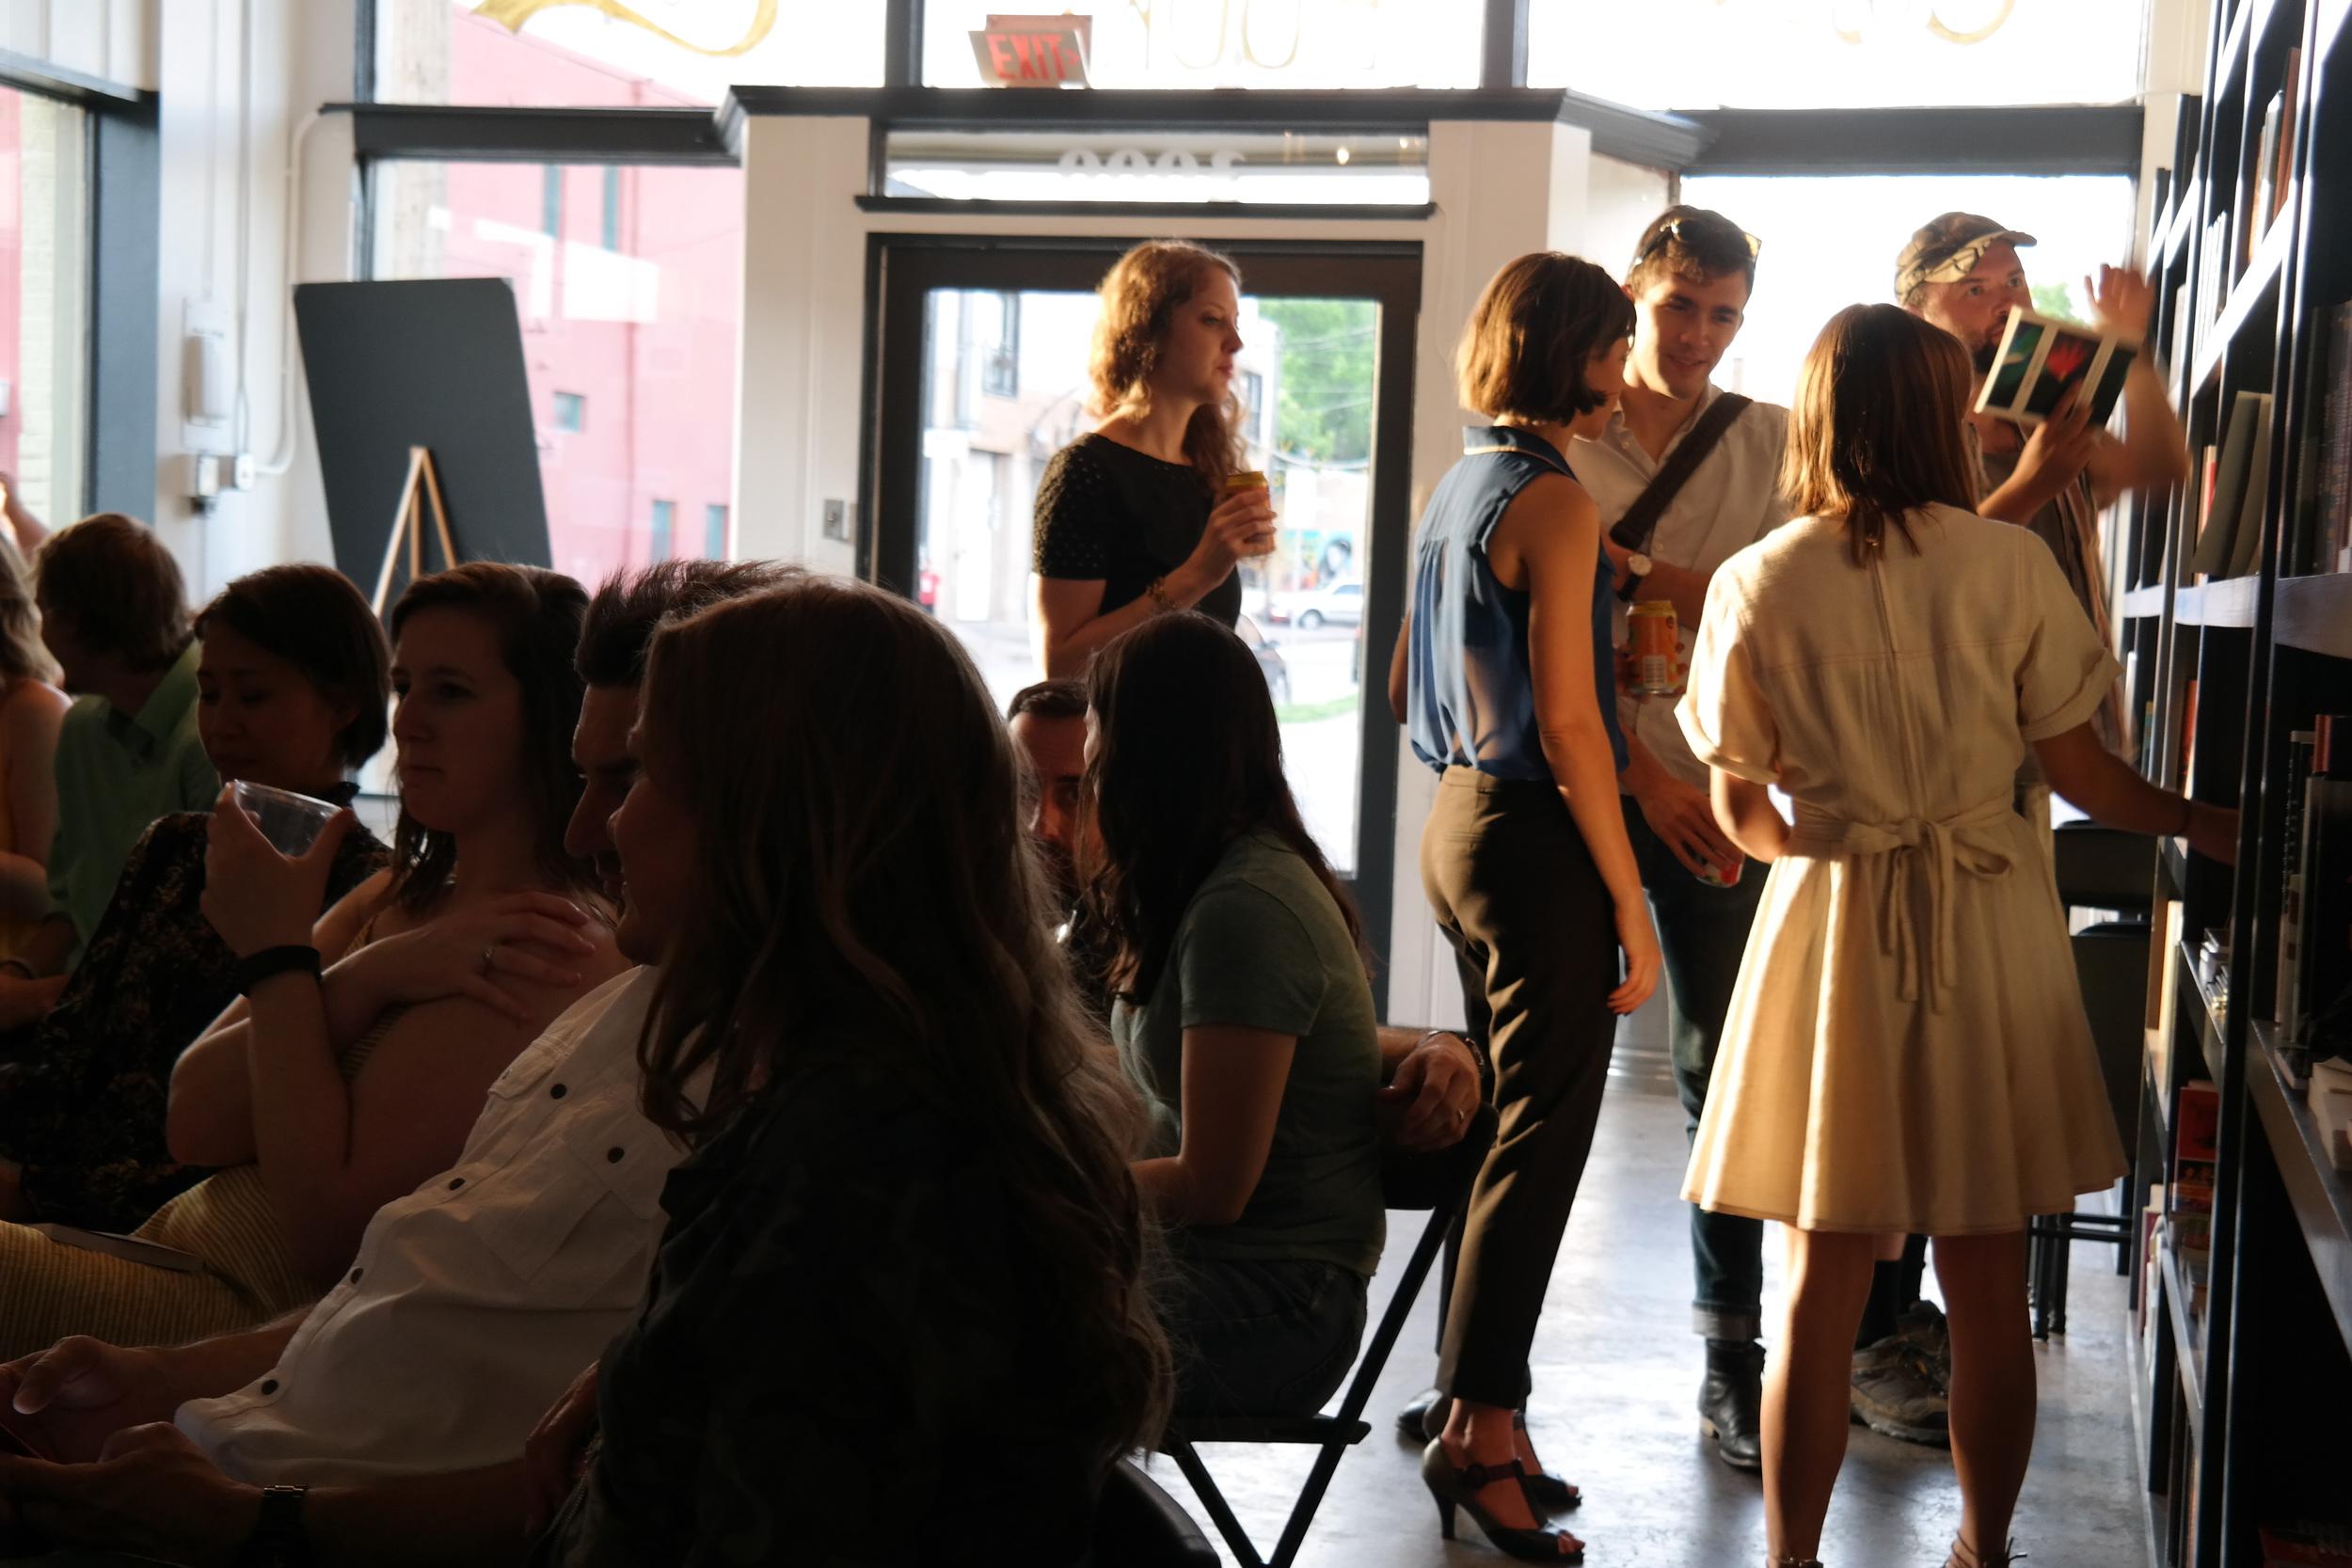 An Austin crowd in Deep Ellum